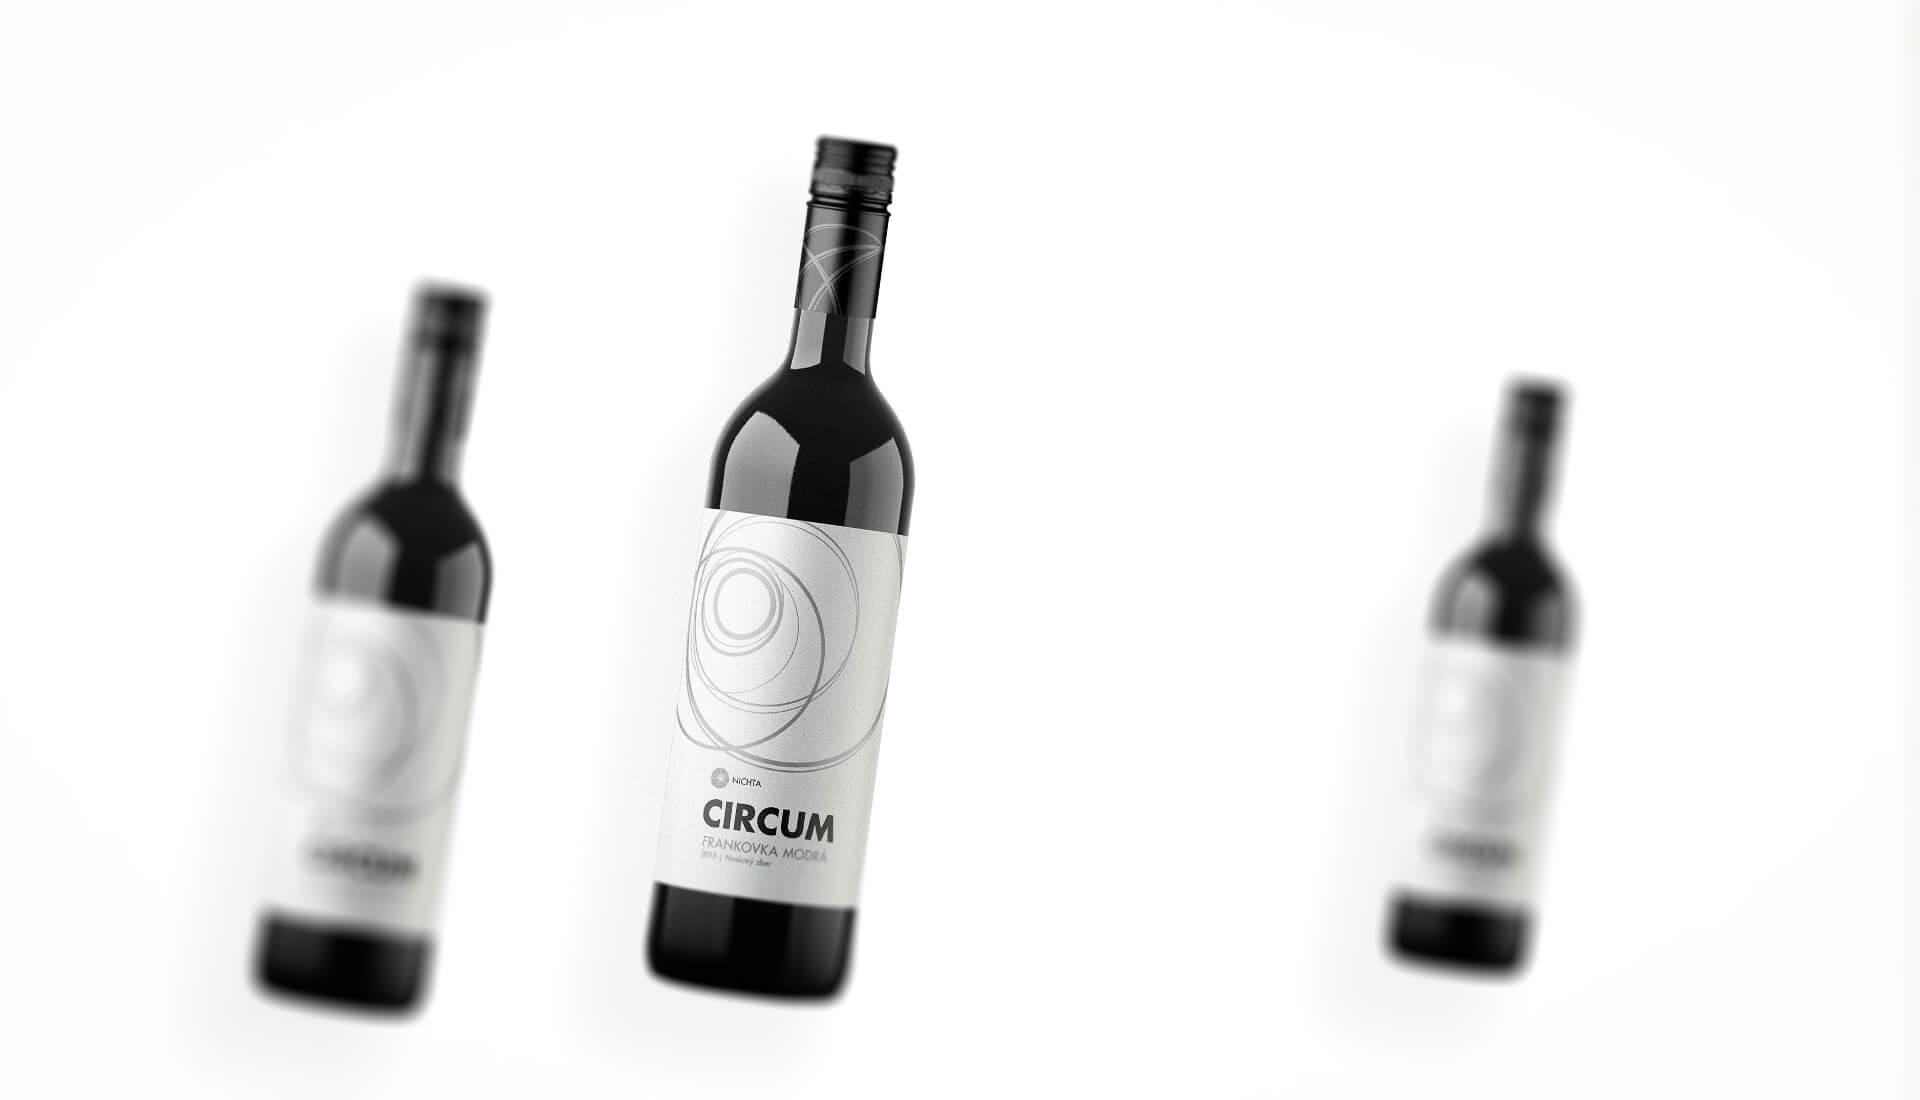 Wine label packaging design CIRCUM NICHTA winery red wines